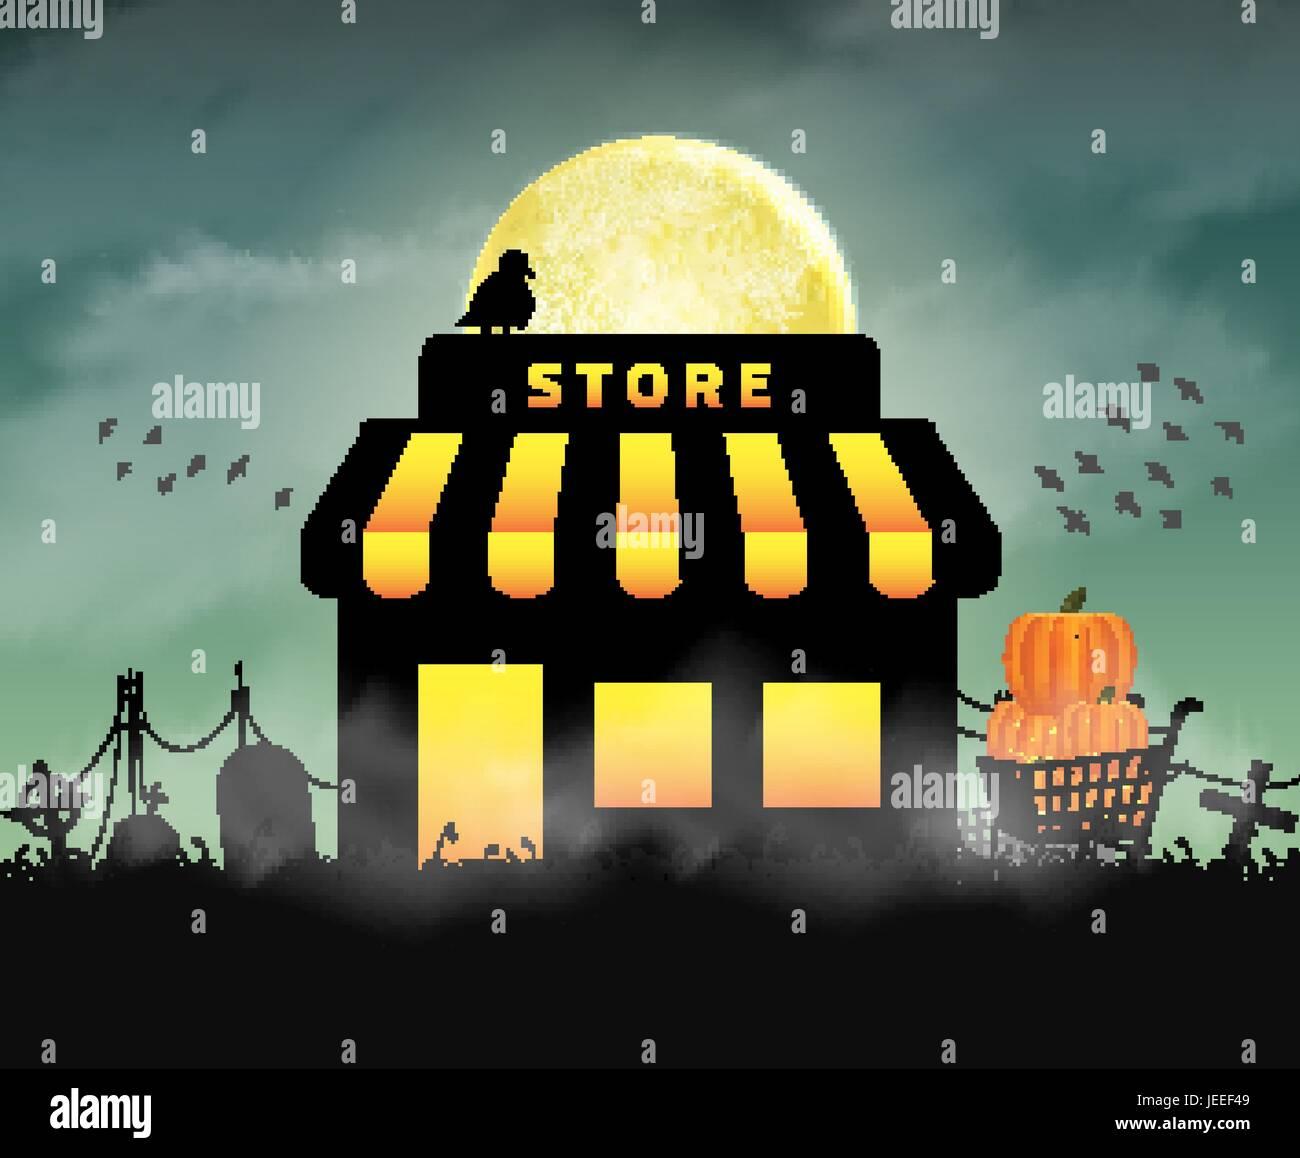 Halloween Store Stock Photos U0026 Halloween Store Stock Images ...